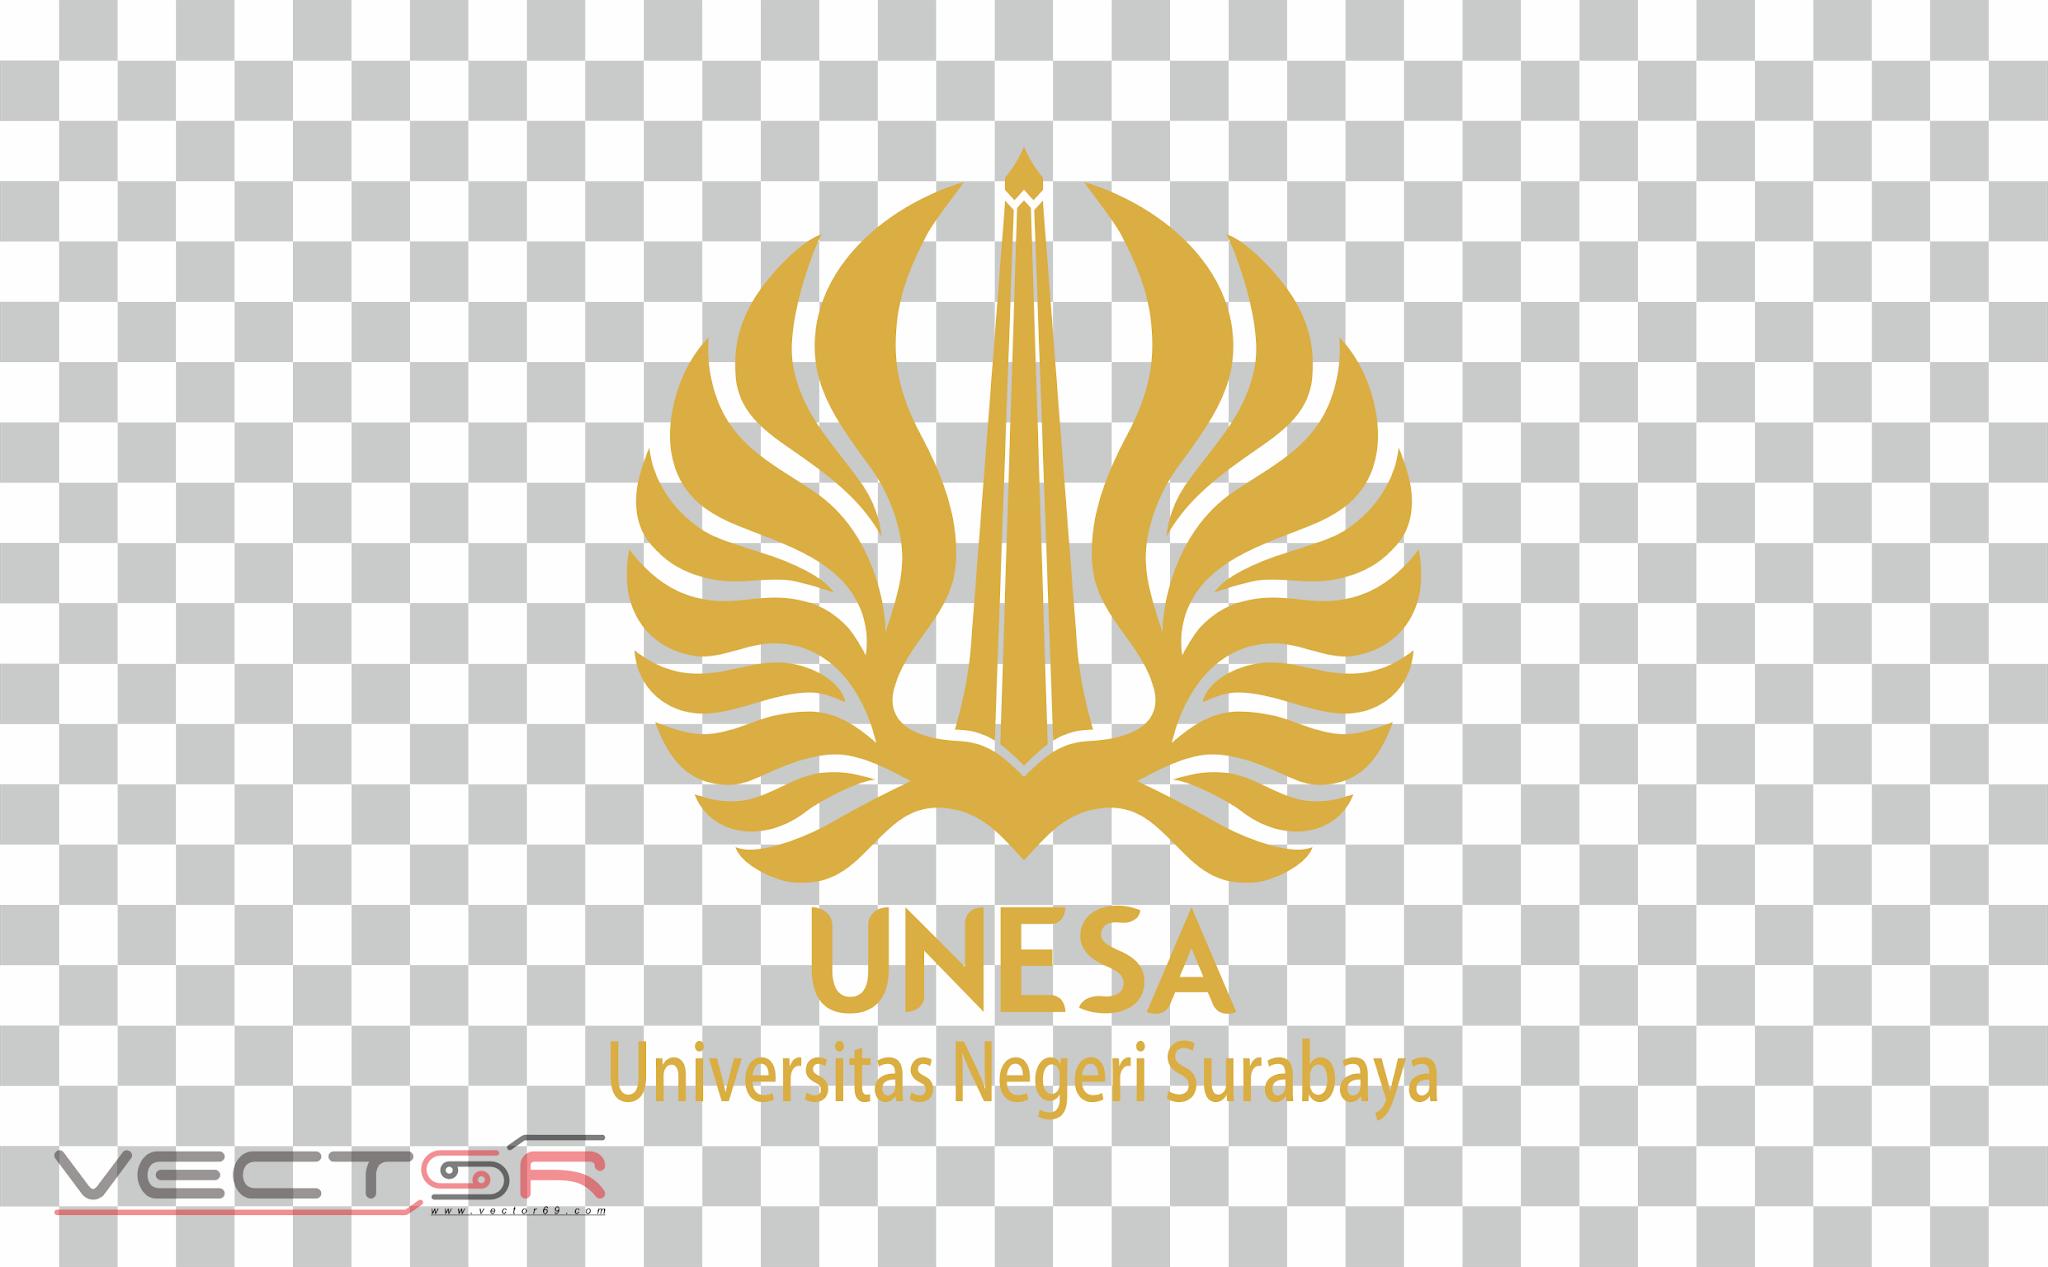 Logo UNESA (Universitas Negeri Surabaya) - Download .PNG (Portable Network Graphics) Transparent Images